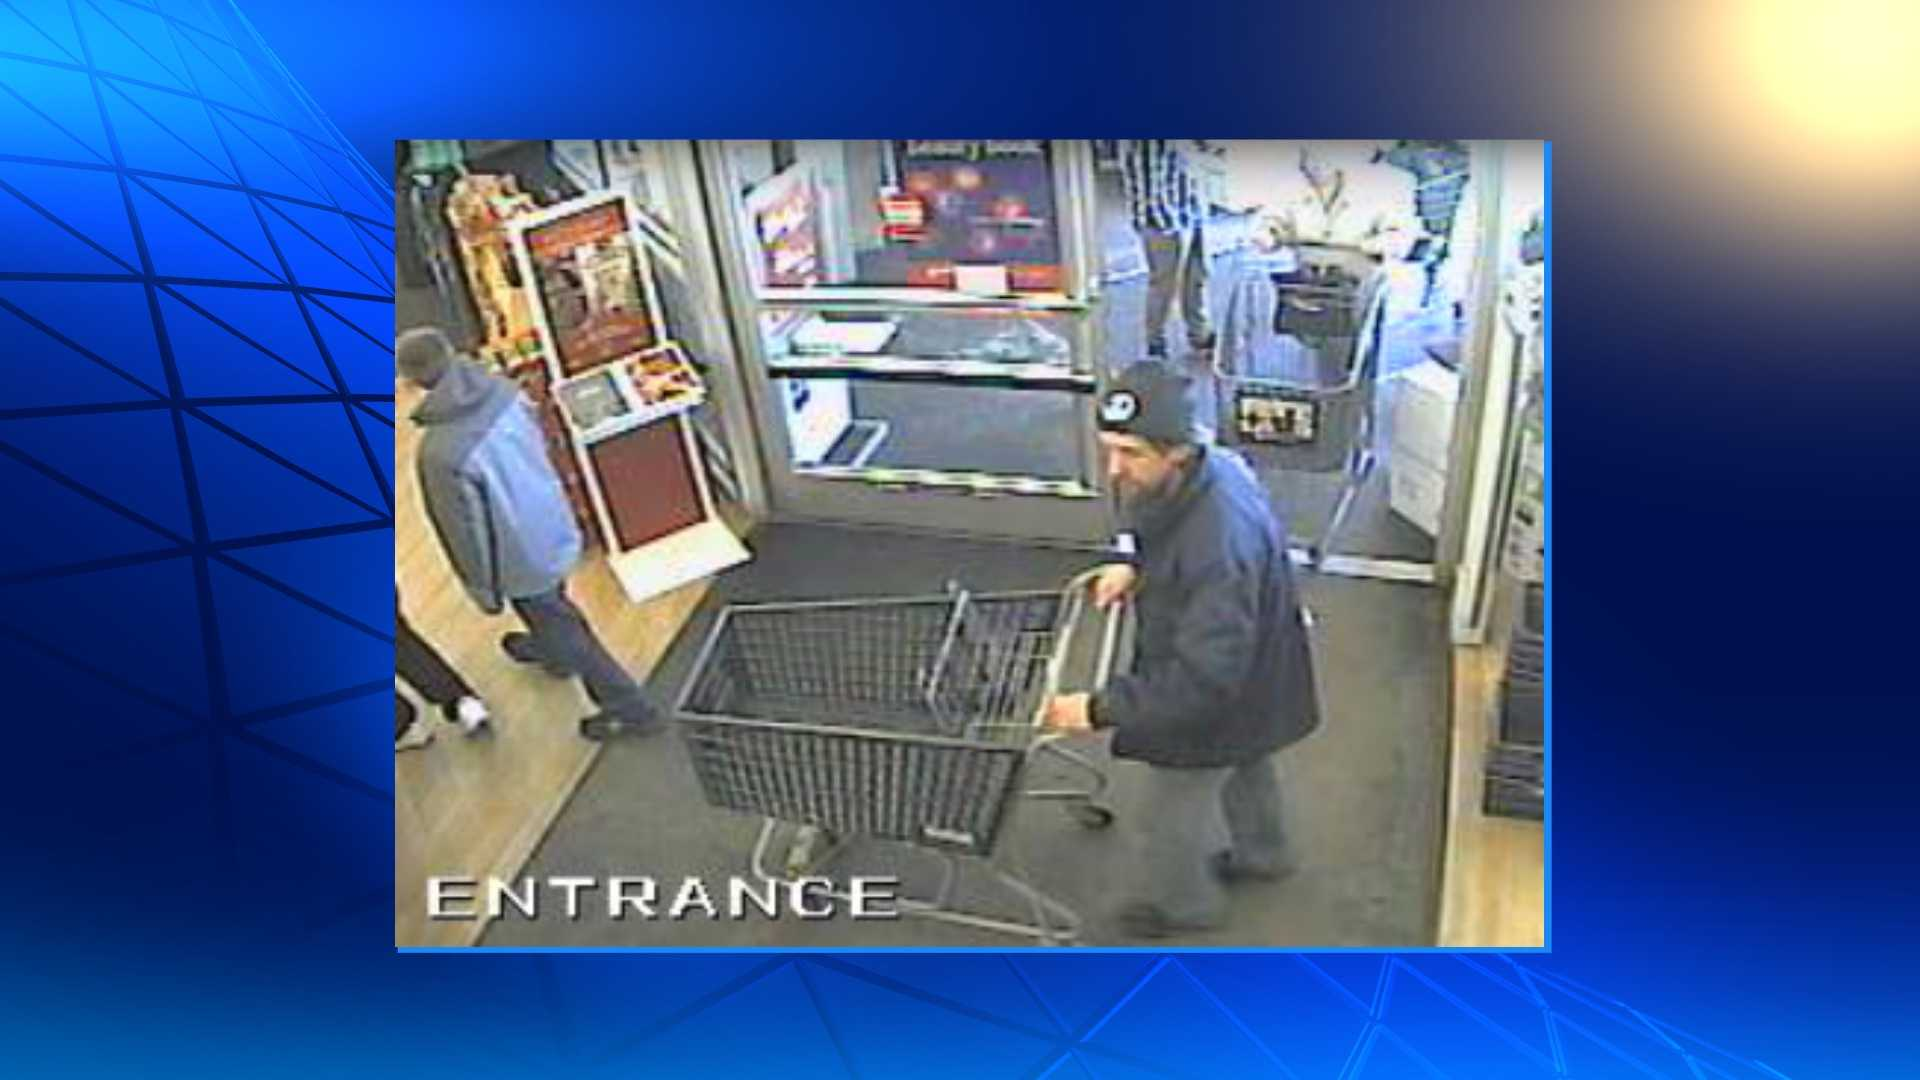 Man suspected of theft